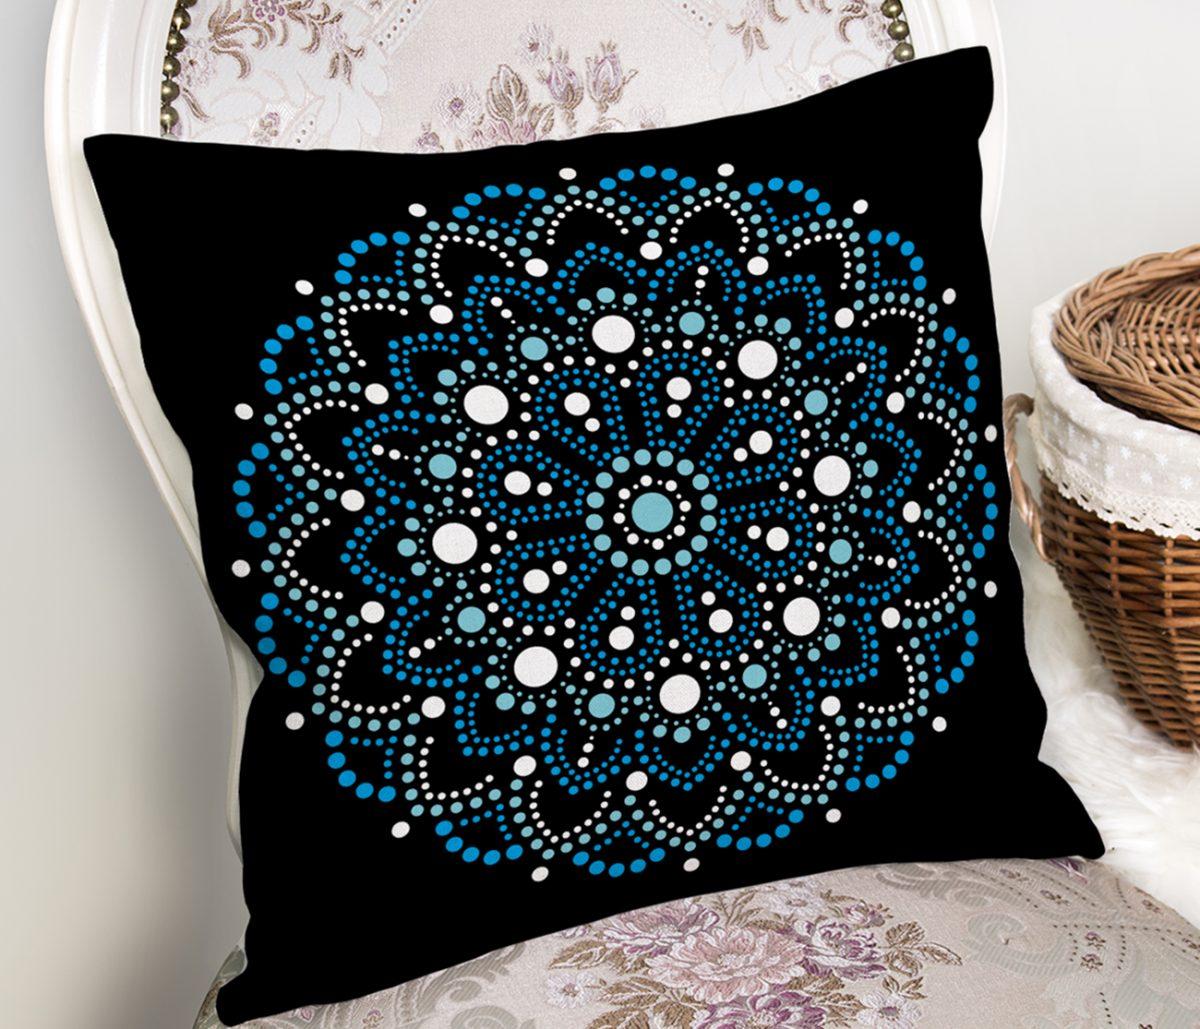 Siyah Zeminde Mavi Boncuklu Mandala Dekoratif Yastık Kılıfı Realhomes